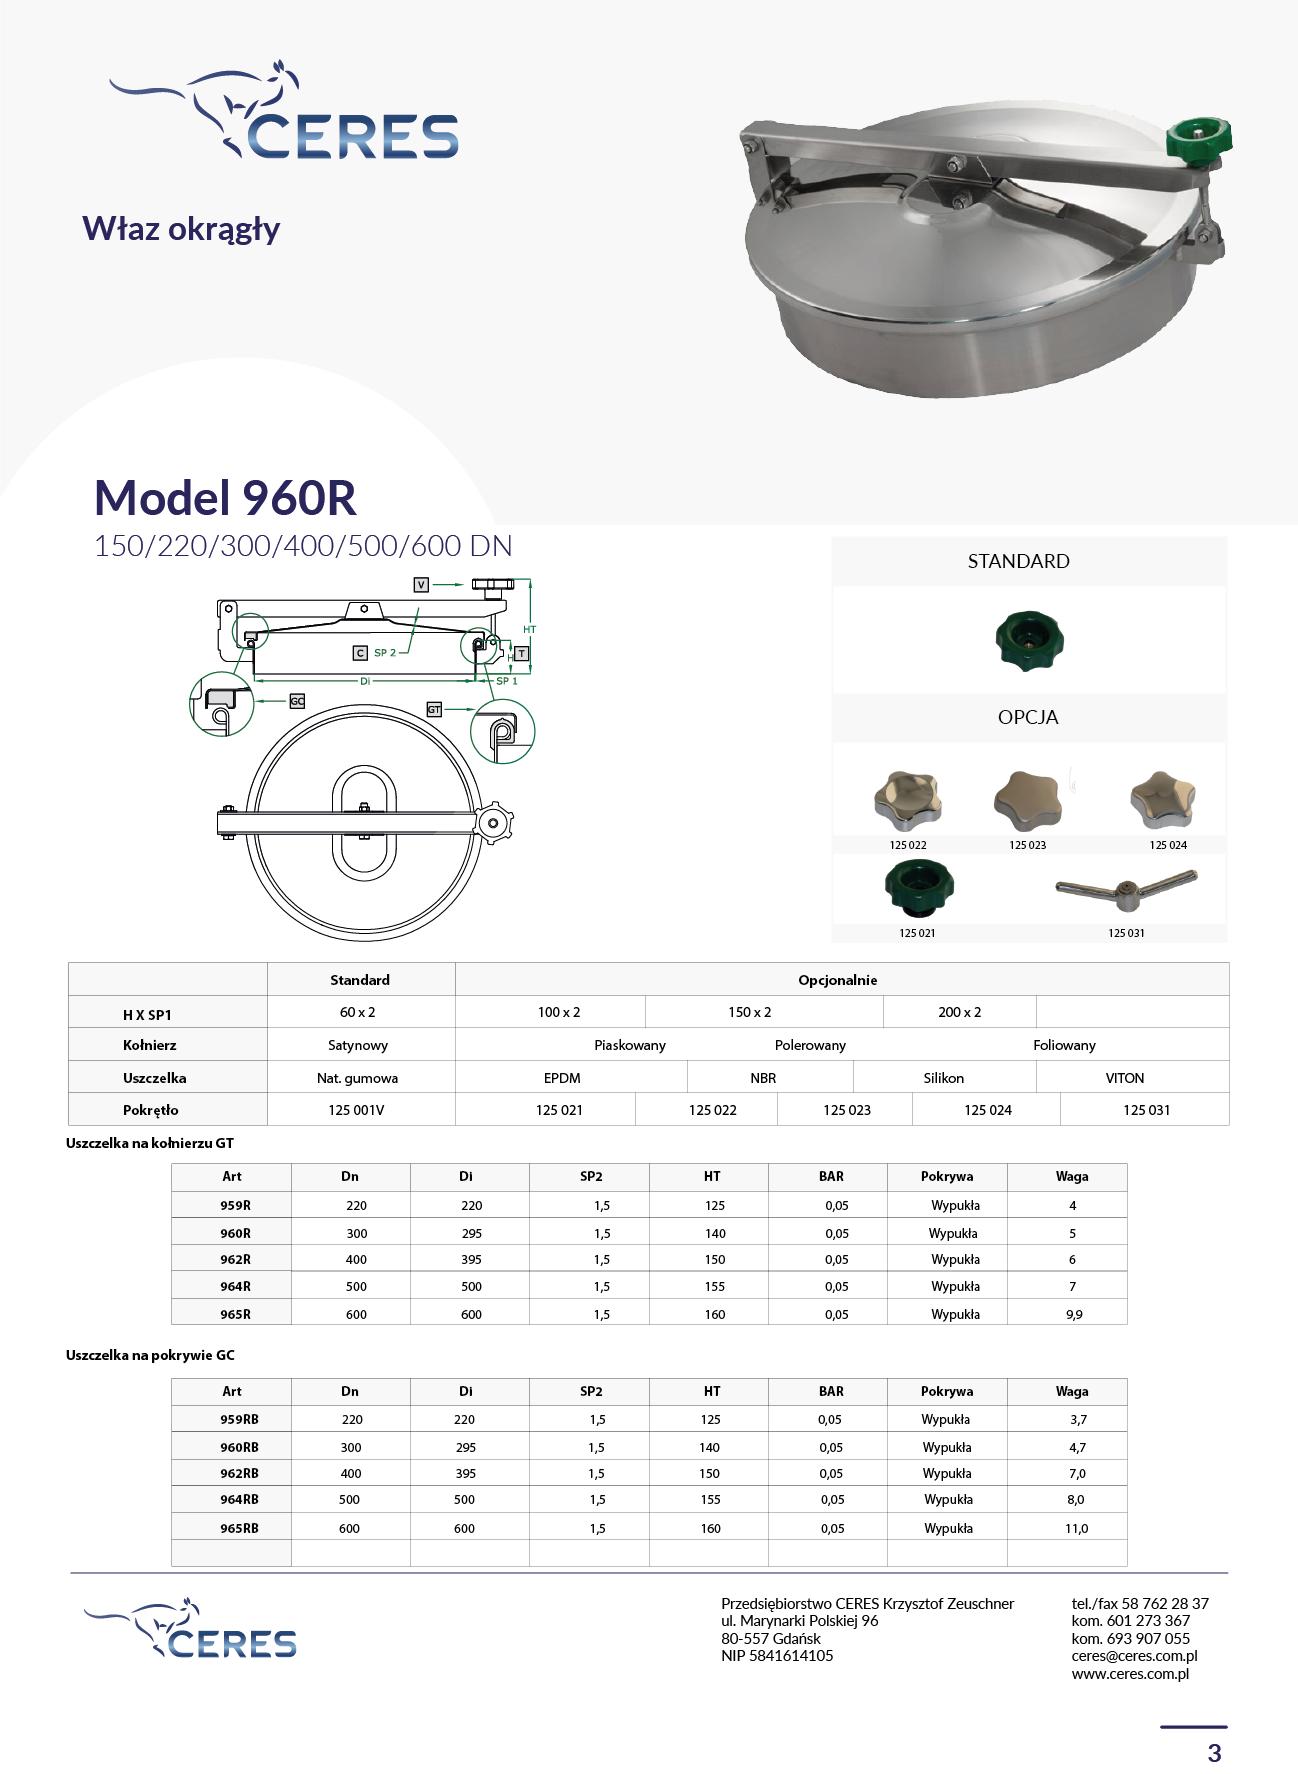 MODEL 960R